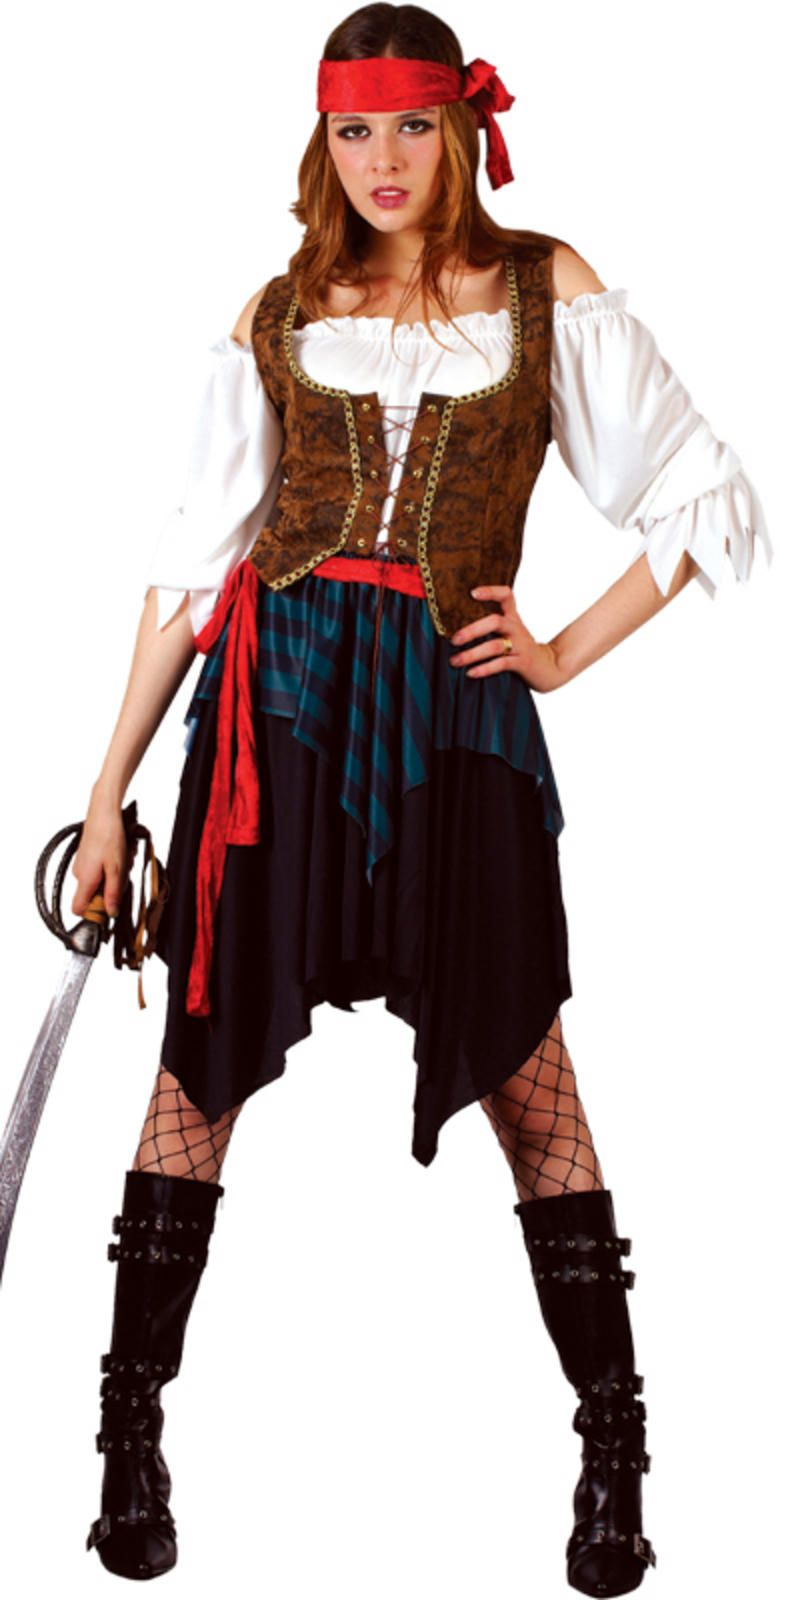 Buy Caribbean Pirate Fancy Dress Costume Ladies (Pirates) - Largest online fancy dress range in the UK - Price Guarantee u0026 FREE Delivery  sc 1 st  Pinterest & Female Pirate | Happy Halloween Hauntings | Pinterest | Caribbean ...